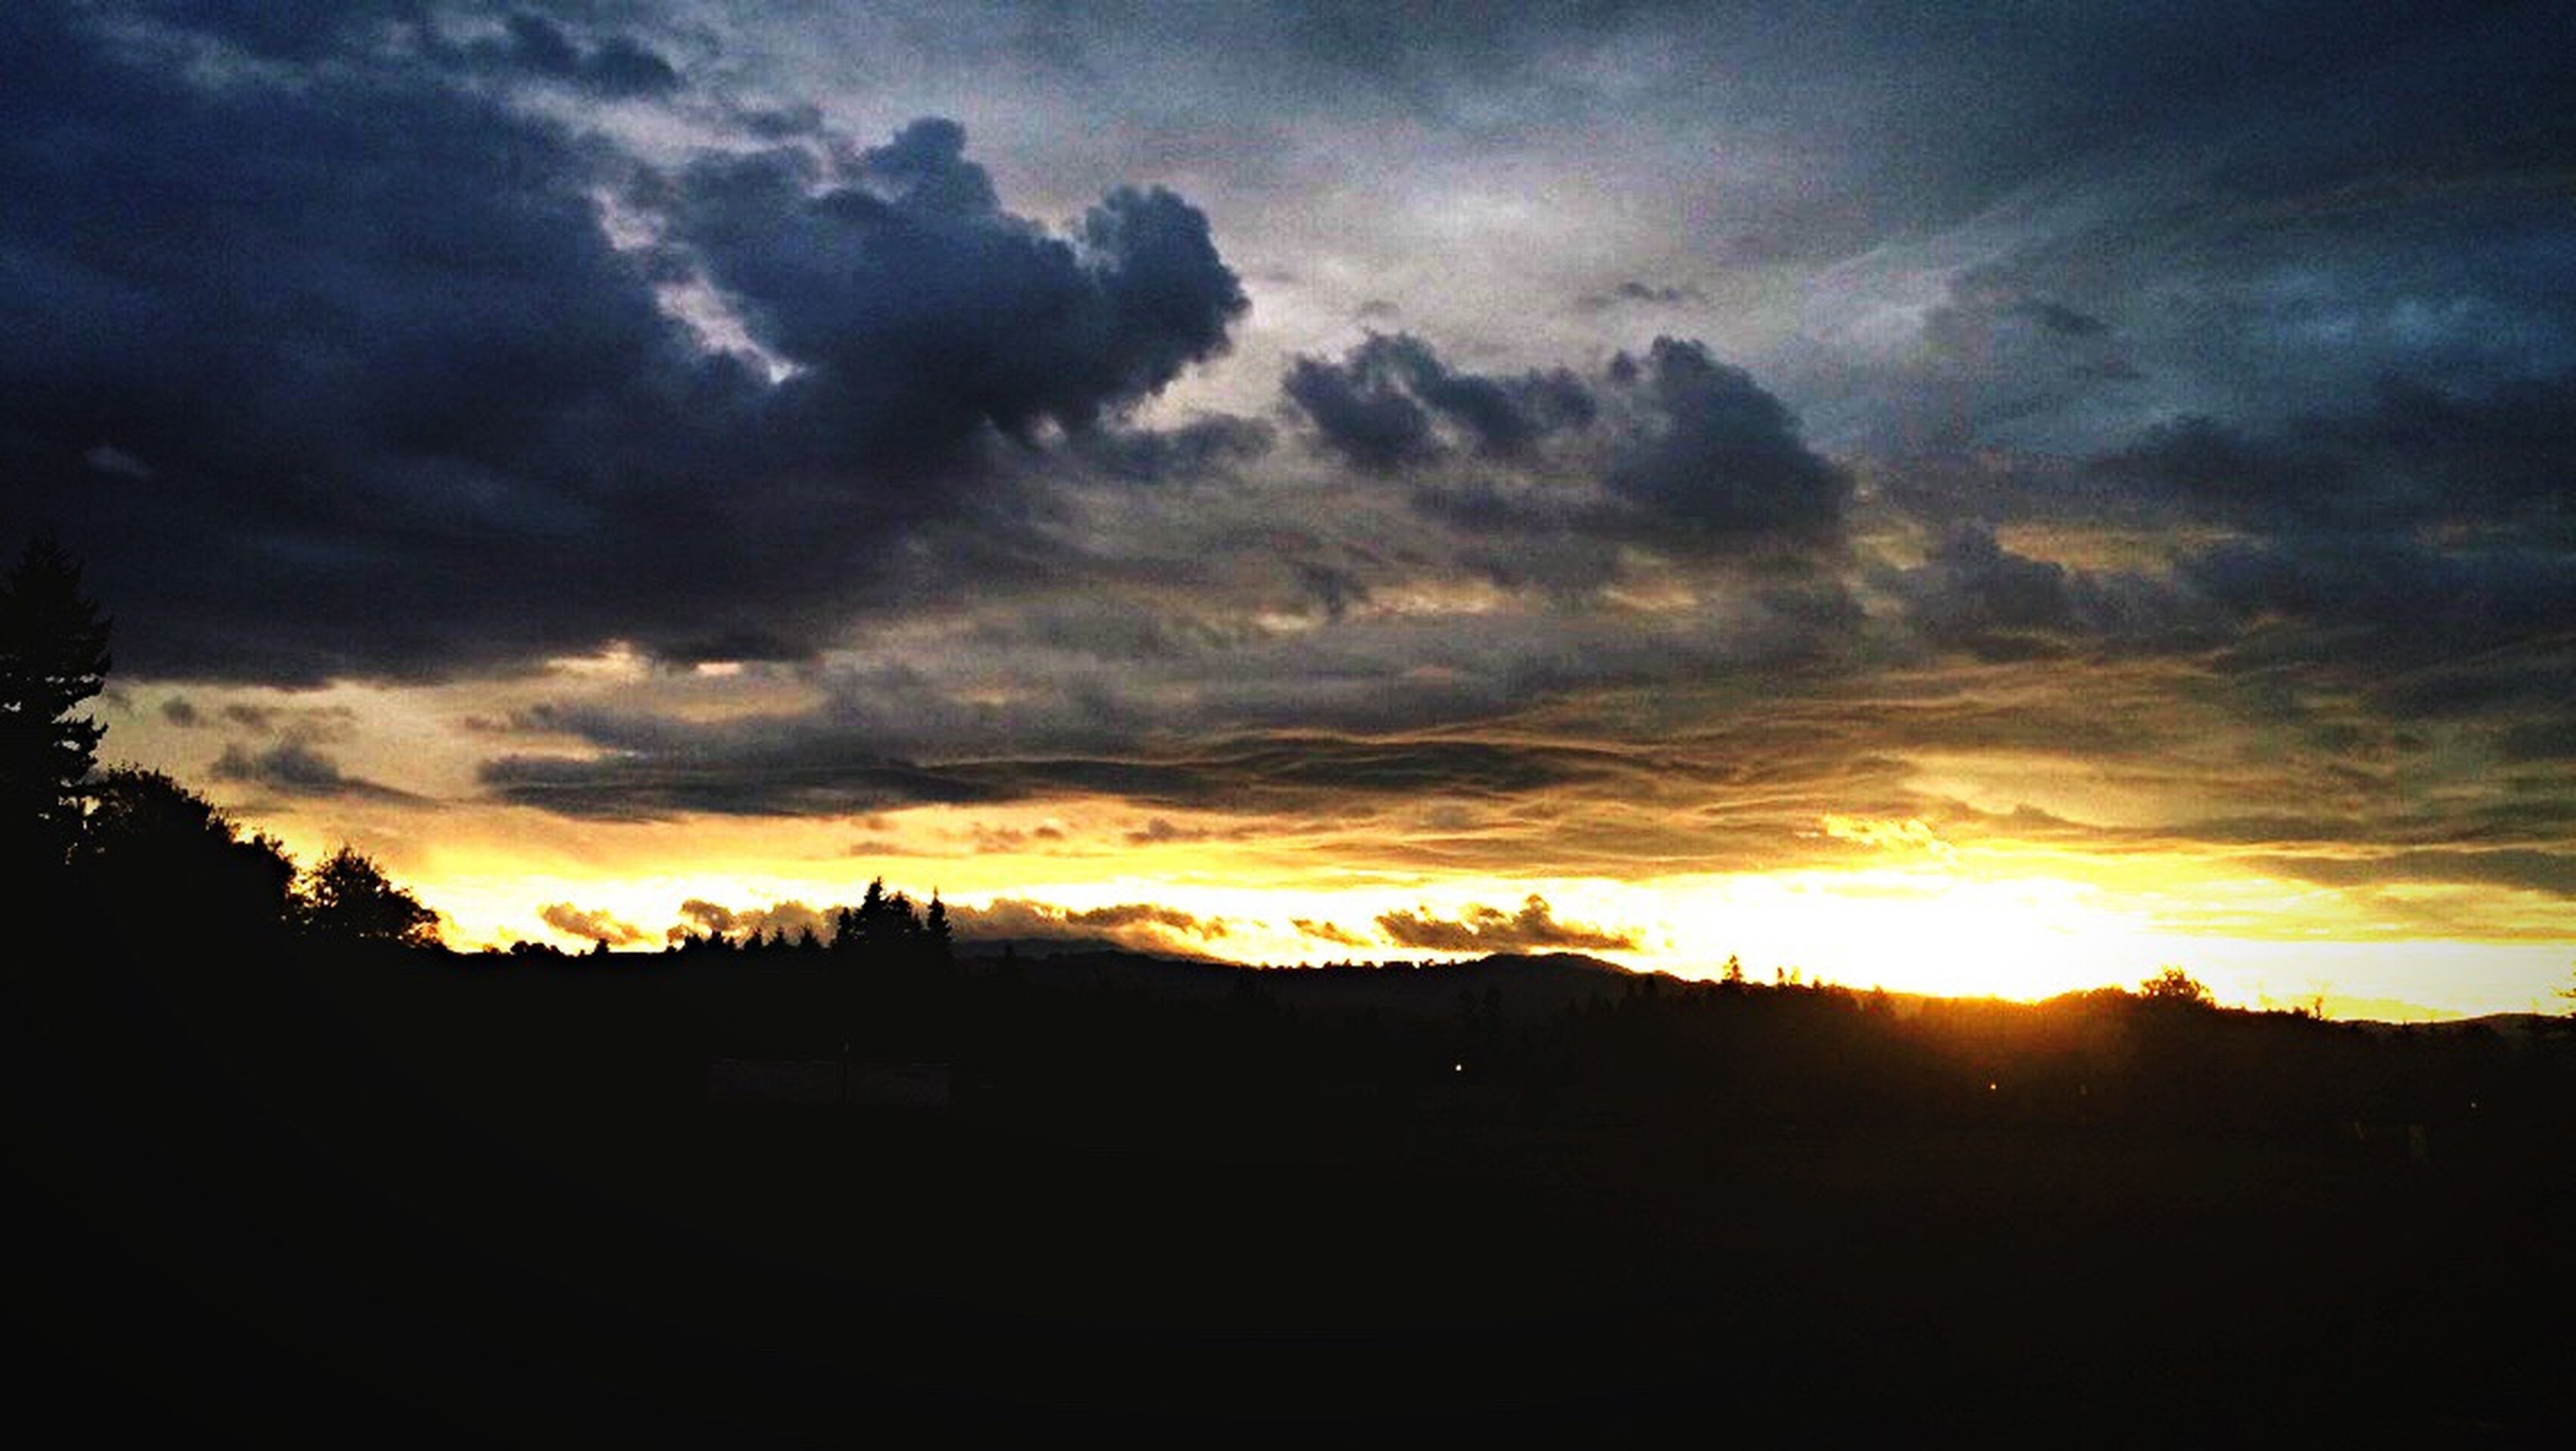 sunset, silhouette, sky, cloud - sky, orange color, scenics, beauty in nature, tranquil scene, dramatic sky, landscape, tranquility, cloudy, nature, sun, cloud, idyllic, dark, weather, field, moody sky